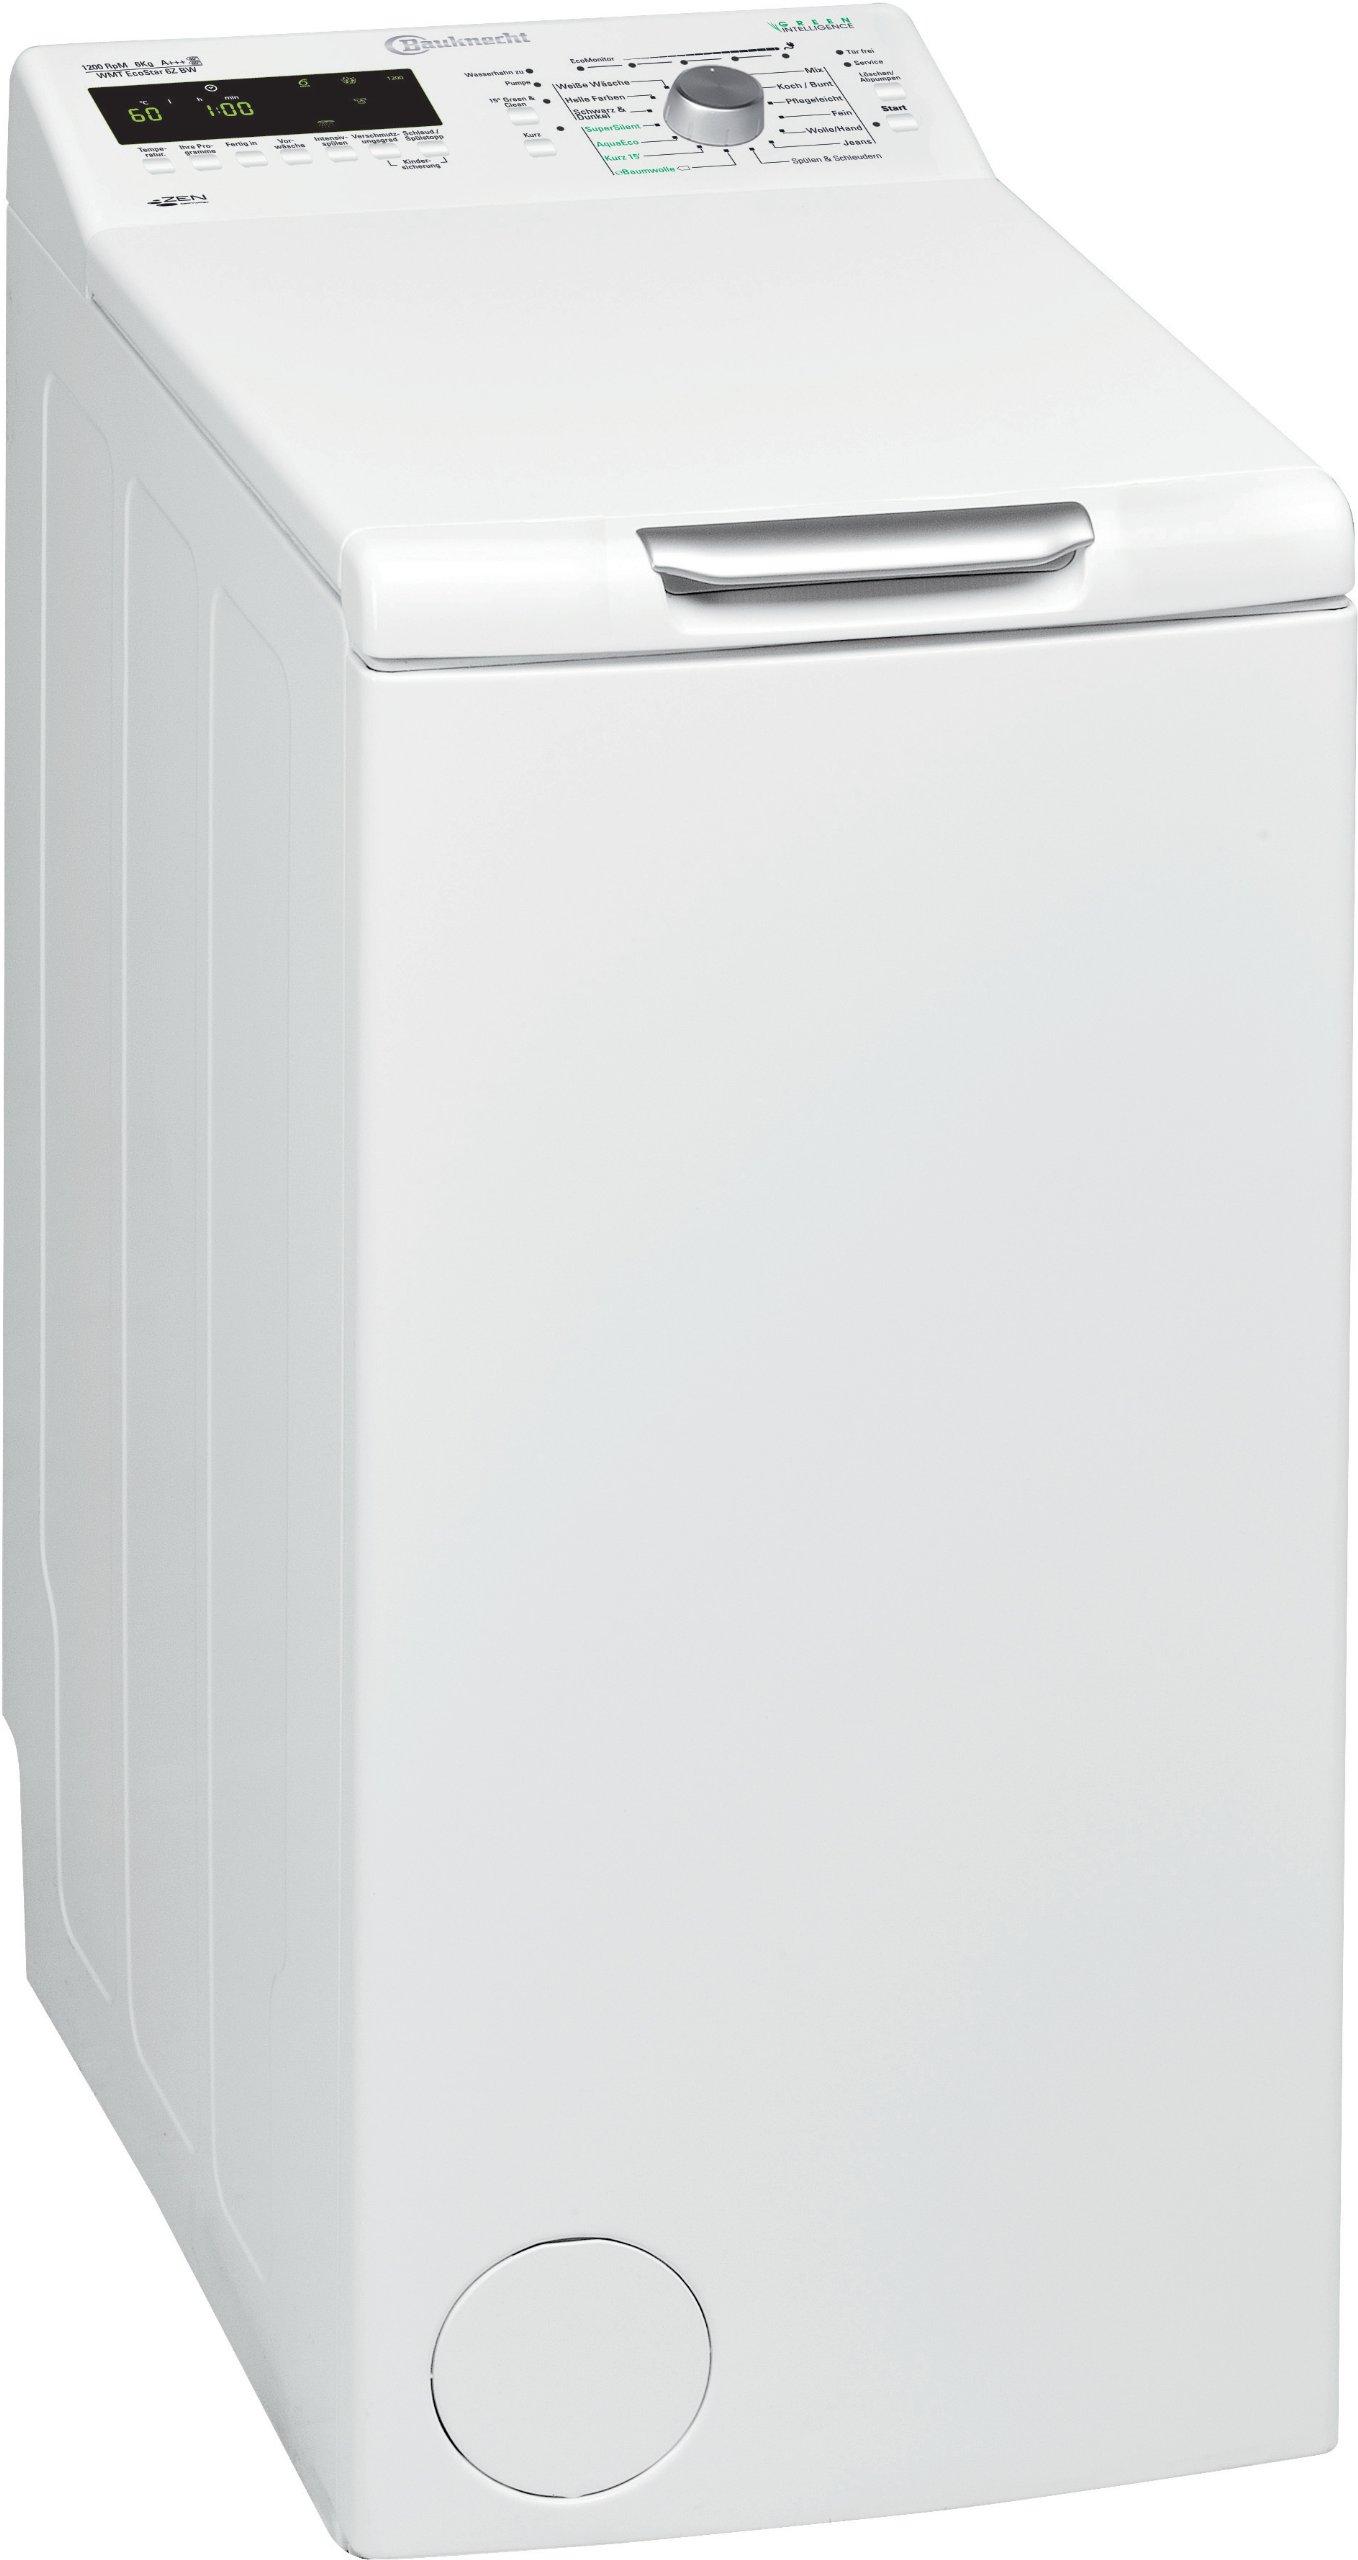 Bauknecht-WMT-EcoStar-6Z-BW-Waschmaschine-Toplader-A-1200-UpM-6-kg-EcoMonitor-ZenTechnologie-E8-display-Vollwasserschutz-wei